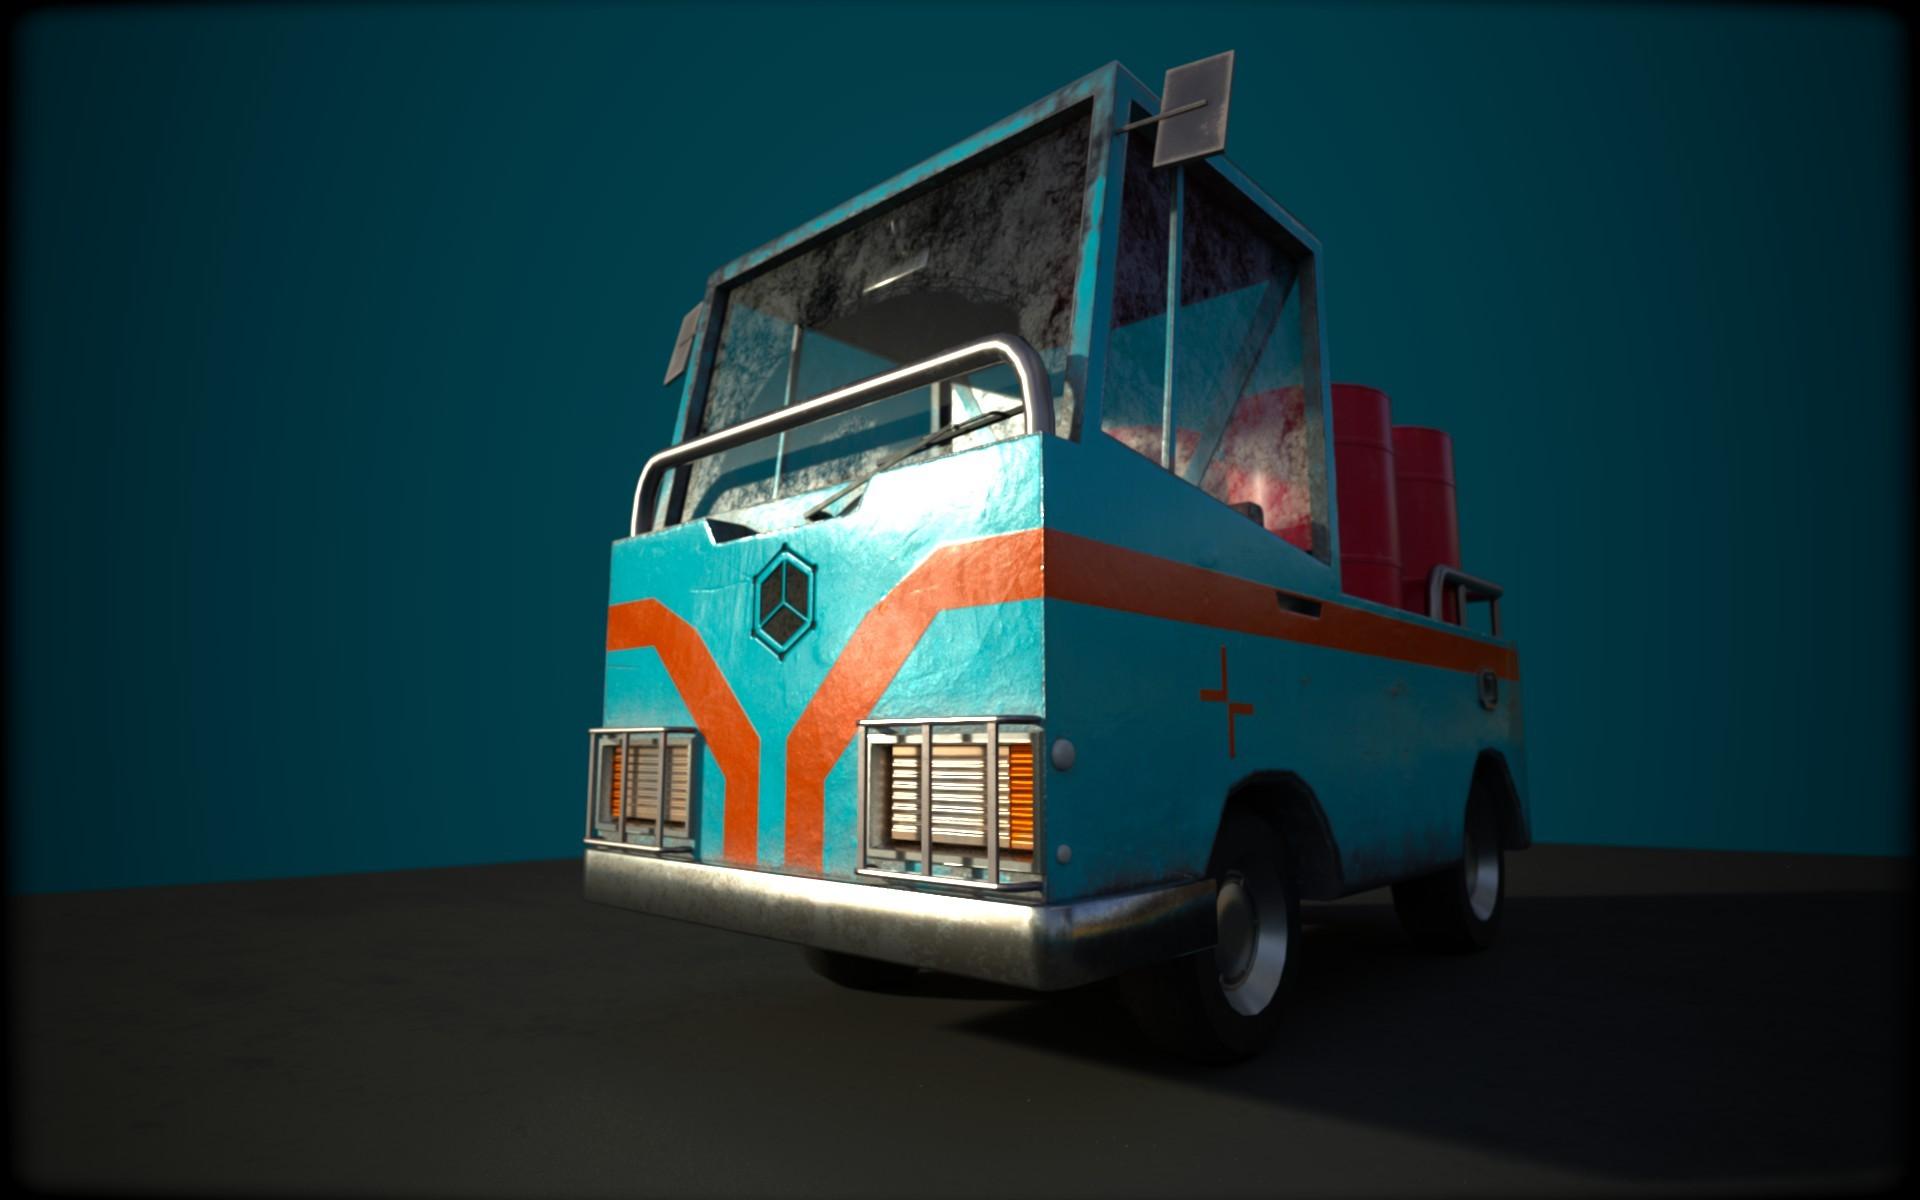 Dani palacio santolaria little truck 01